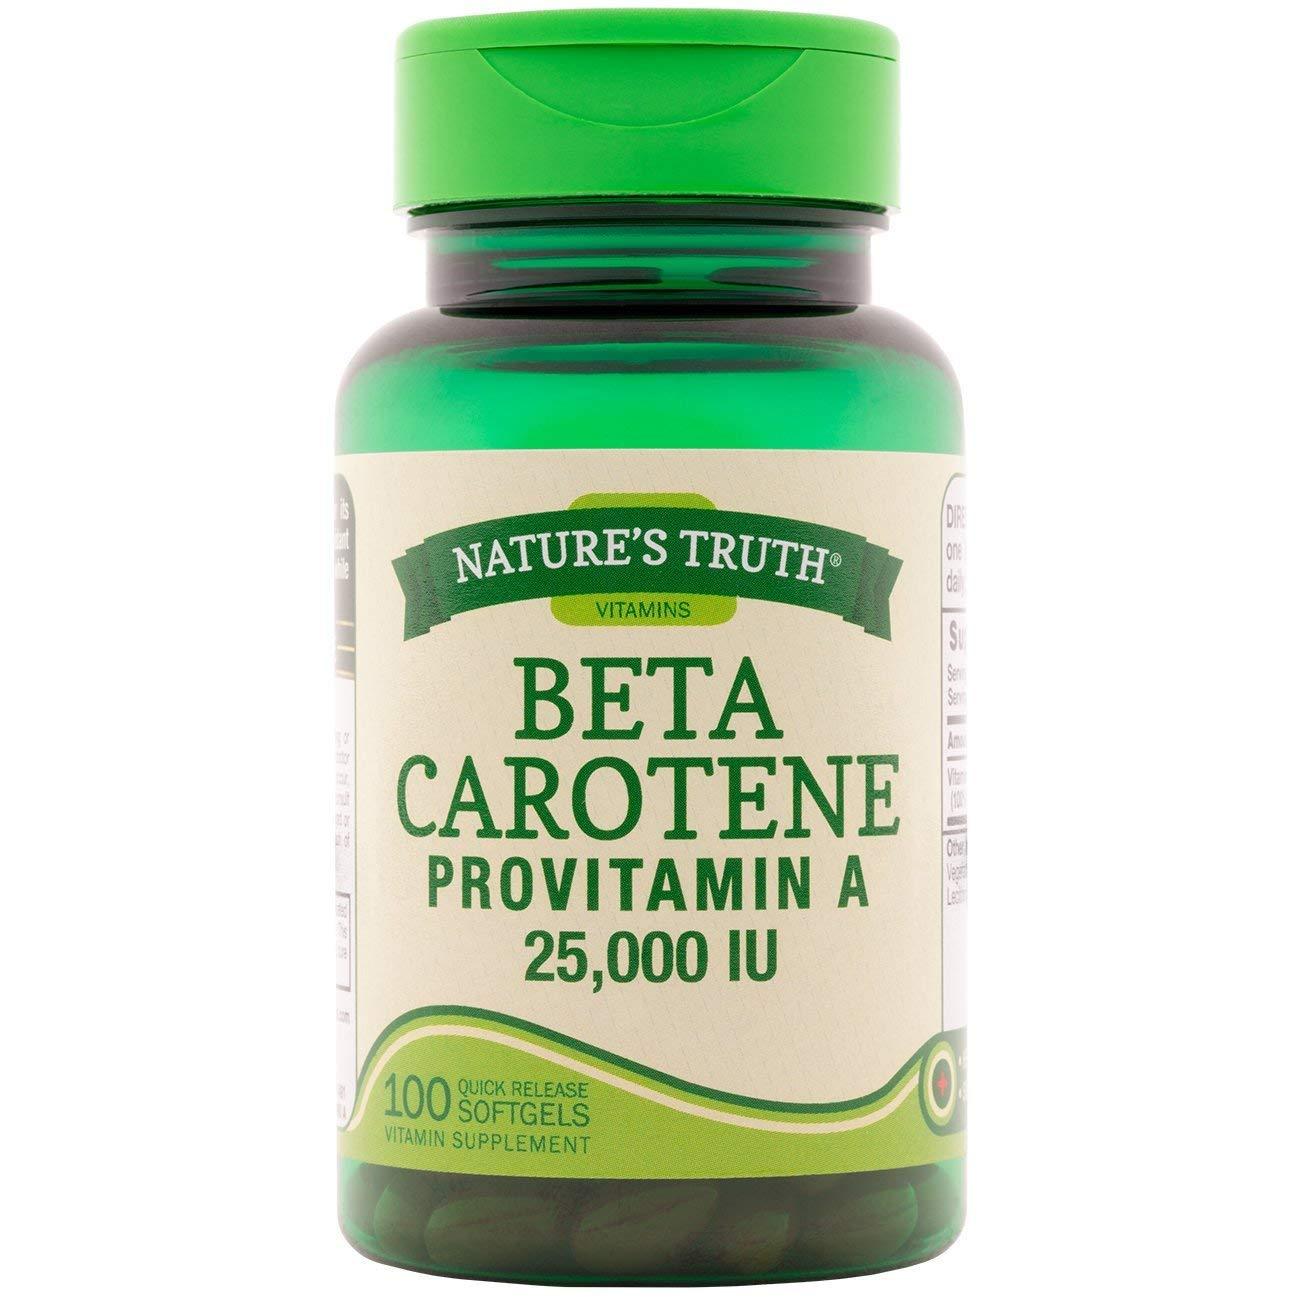 Nature's Truth Beta Carotene 25,000 IU Vitamin Supplement - 100 Softgels, Pack of 2